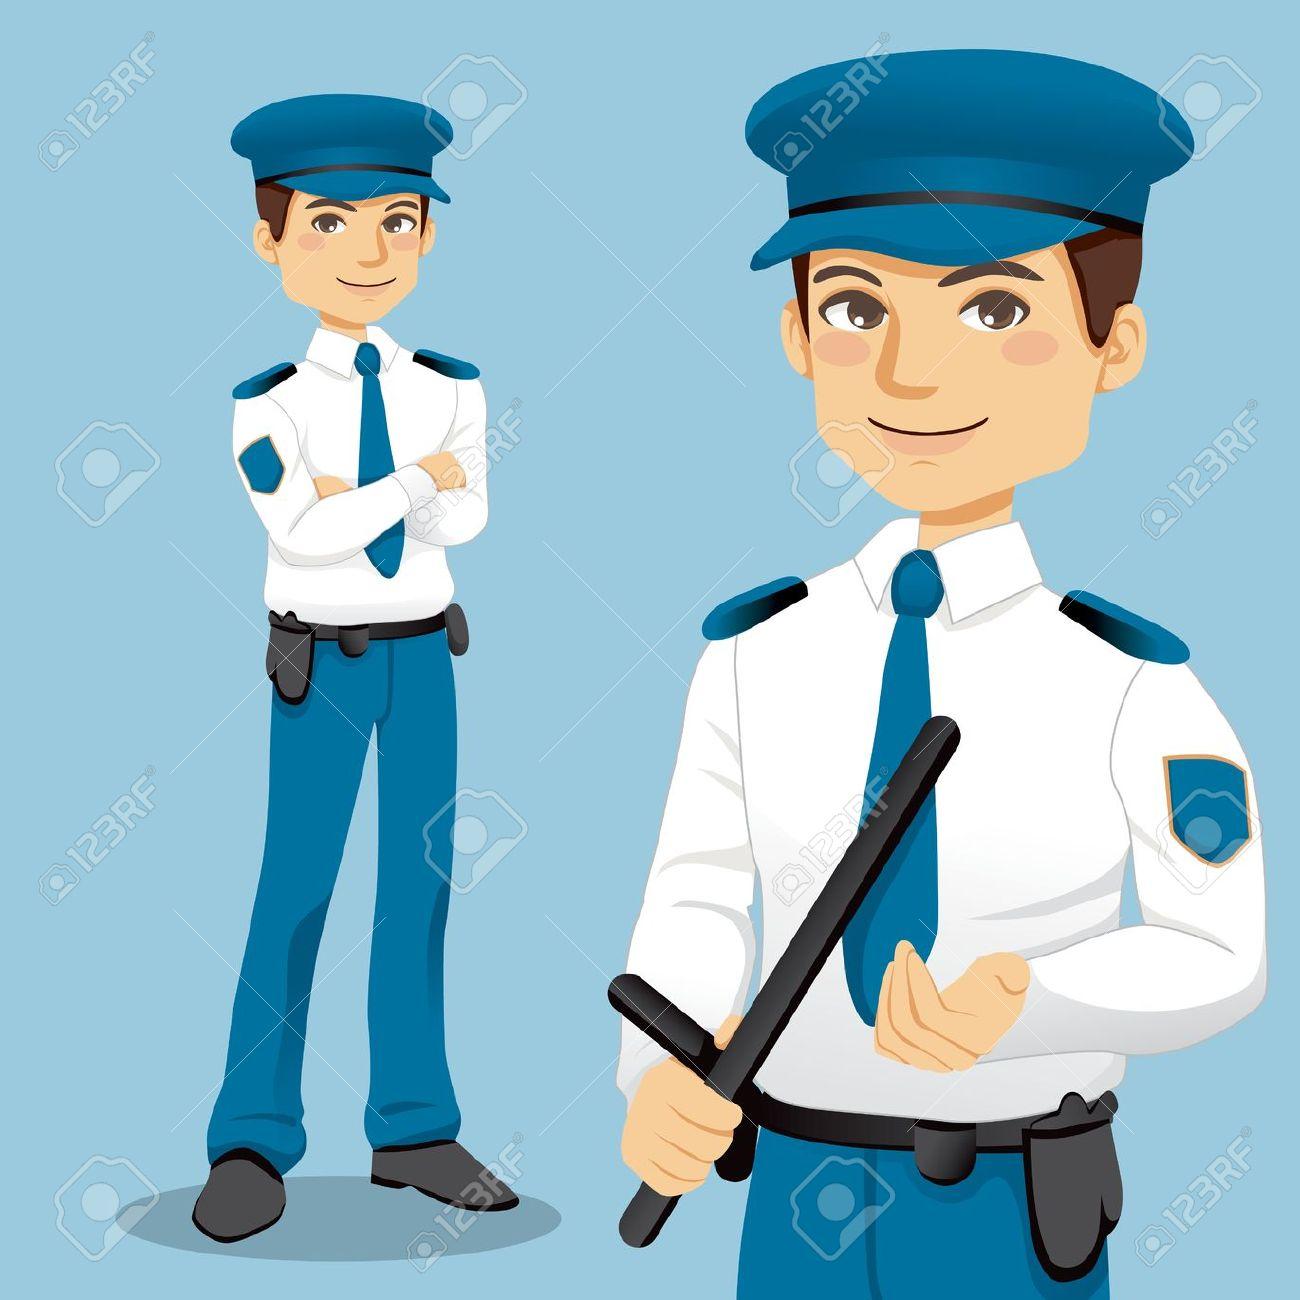 School security guard clipart.